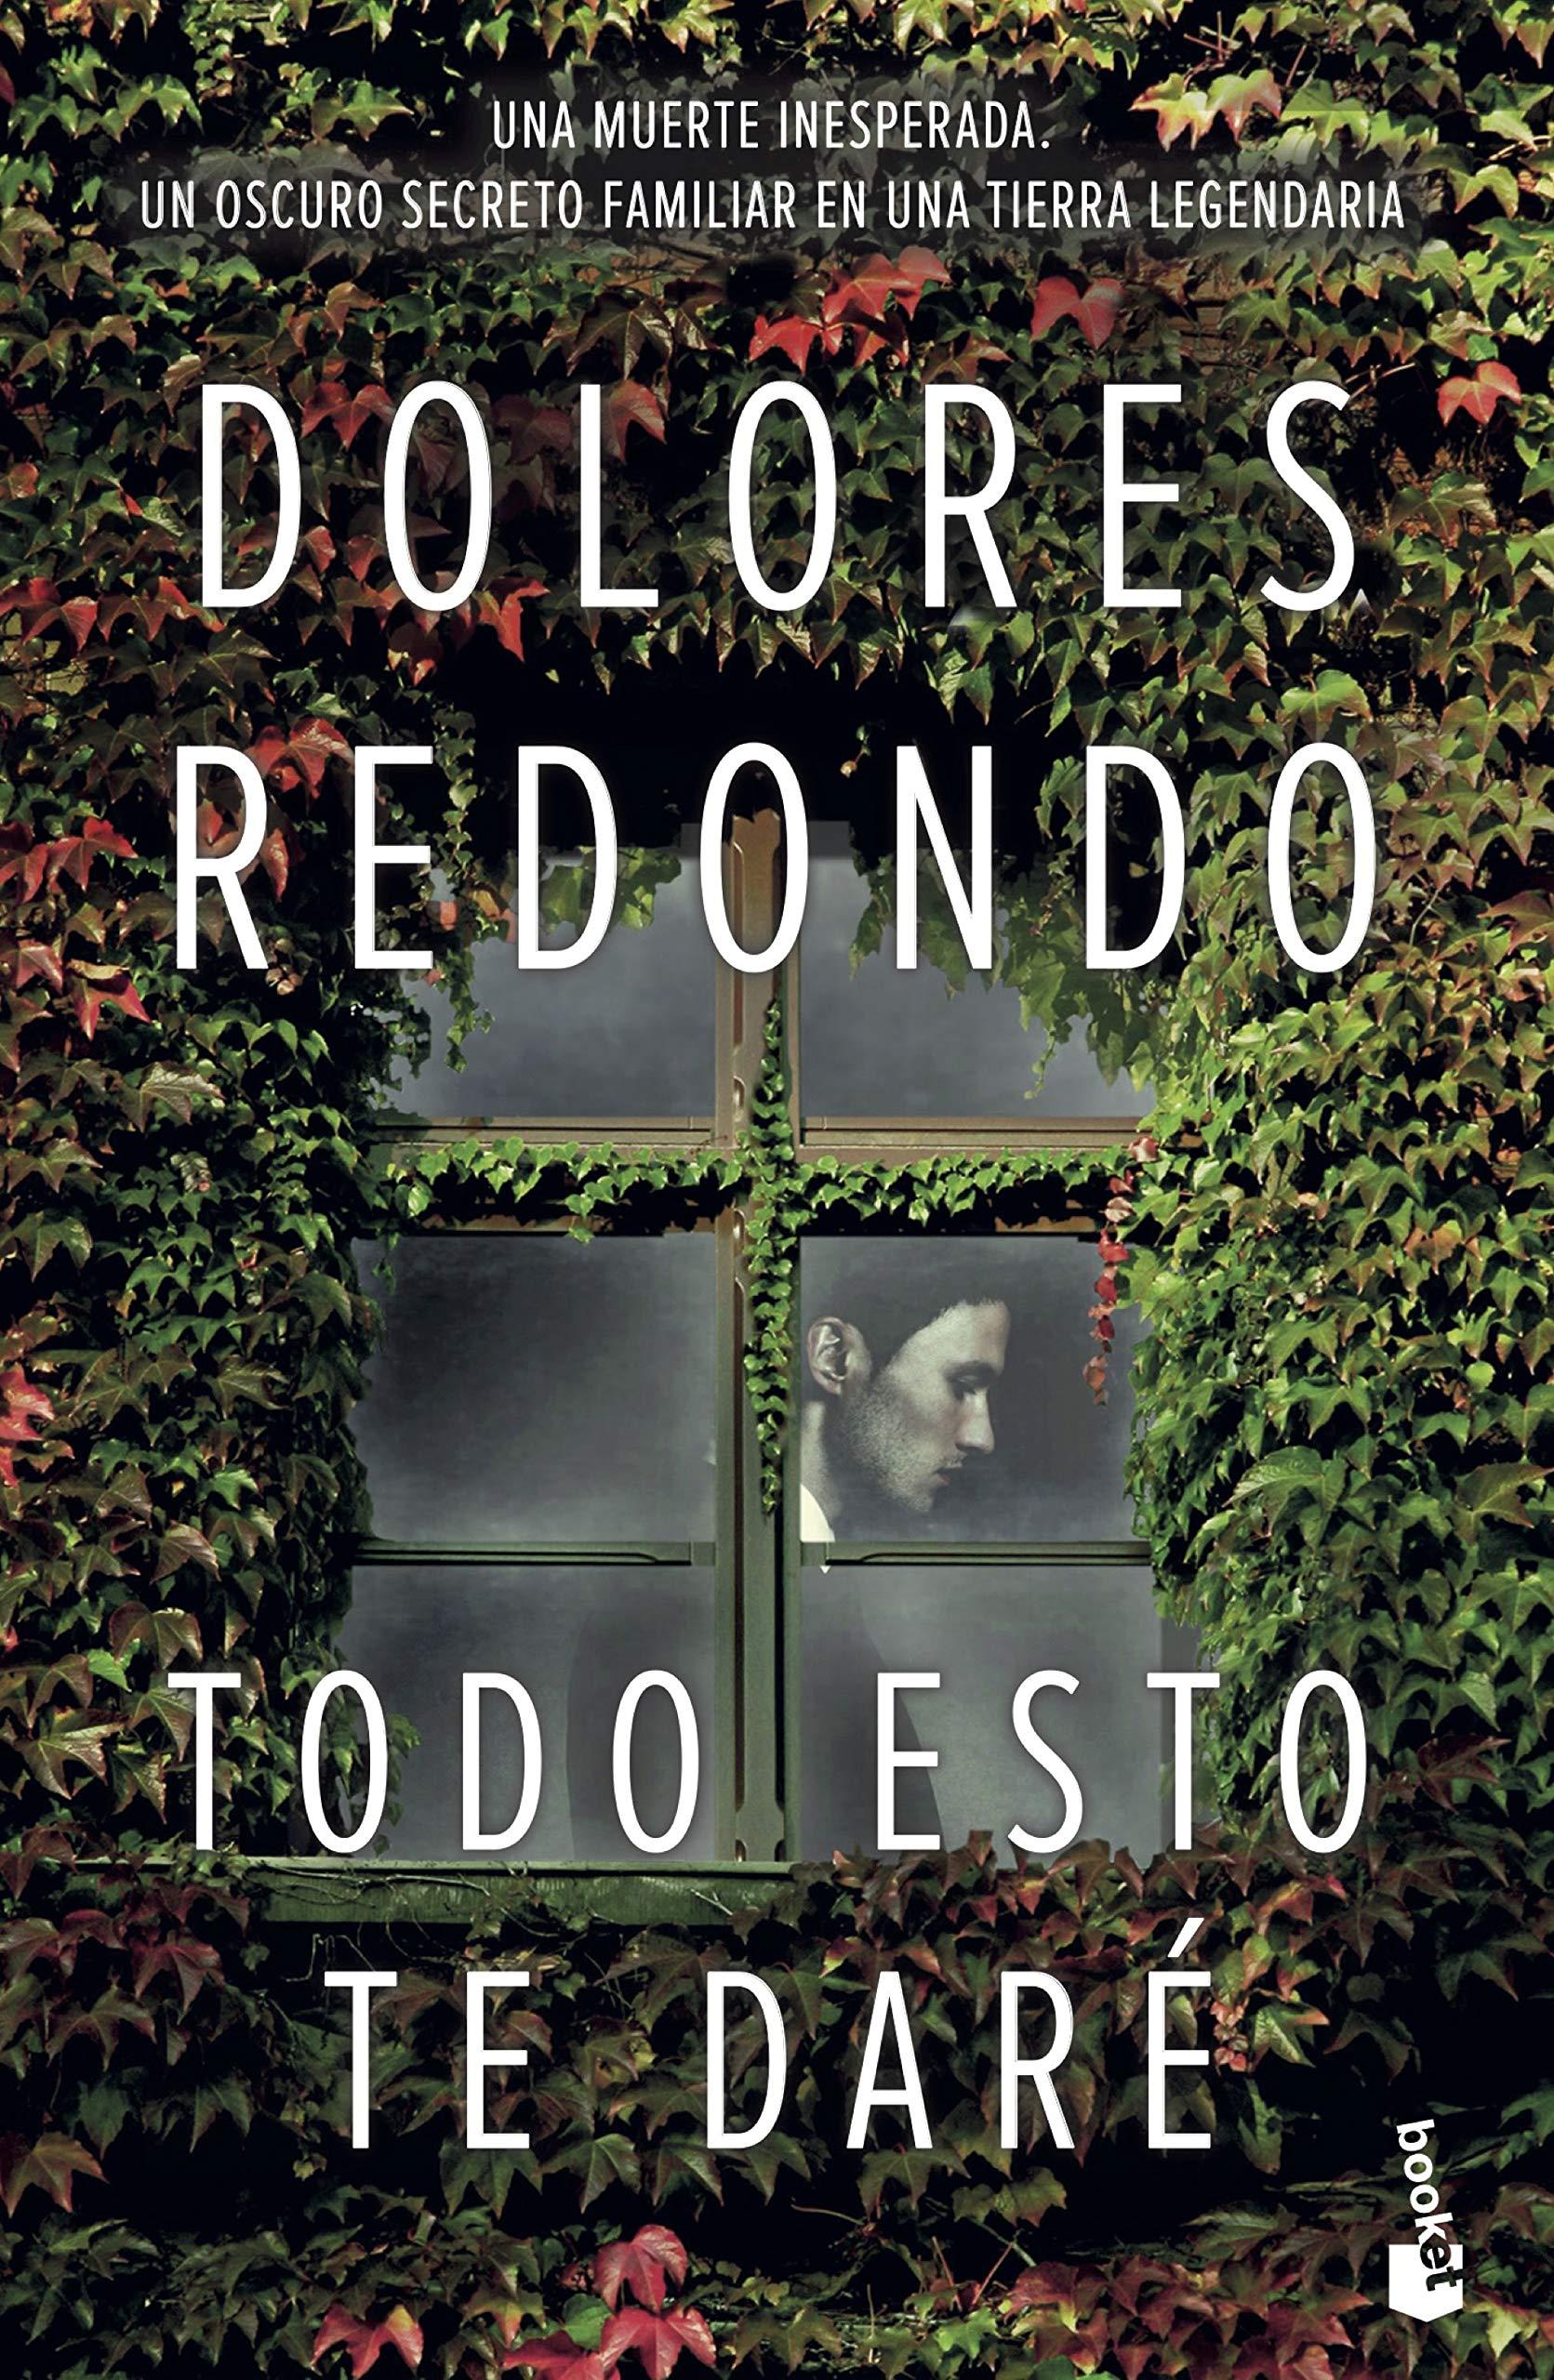 Todo esto te daré (NF Novela): Amazon.es: Dolores Redondo: Libros